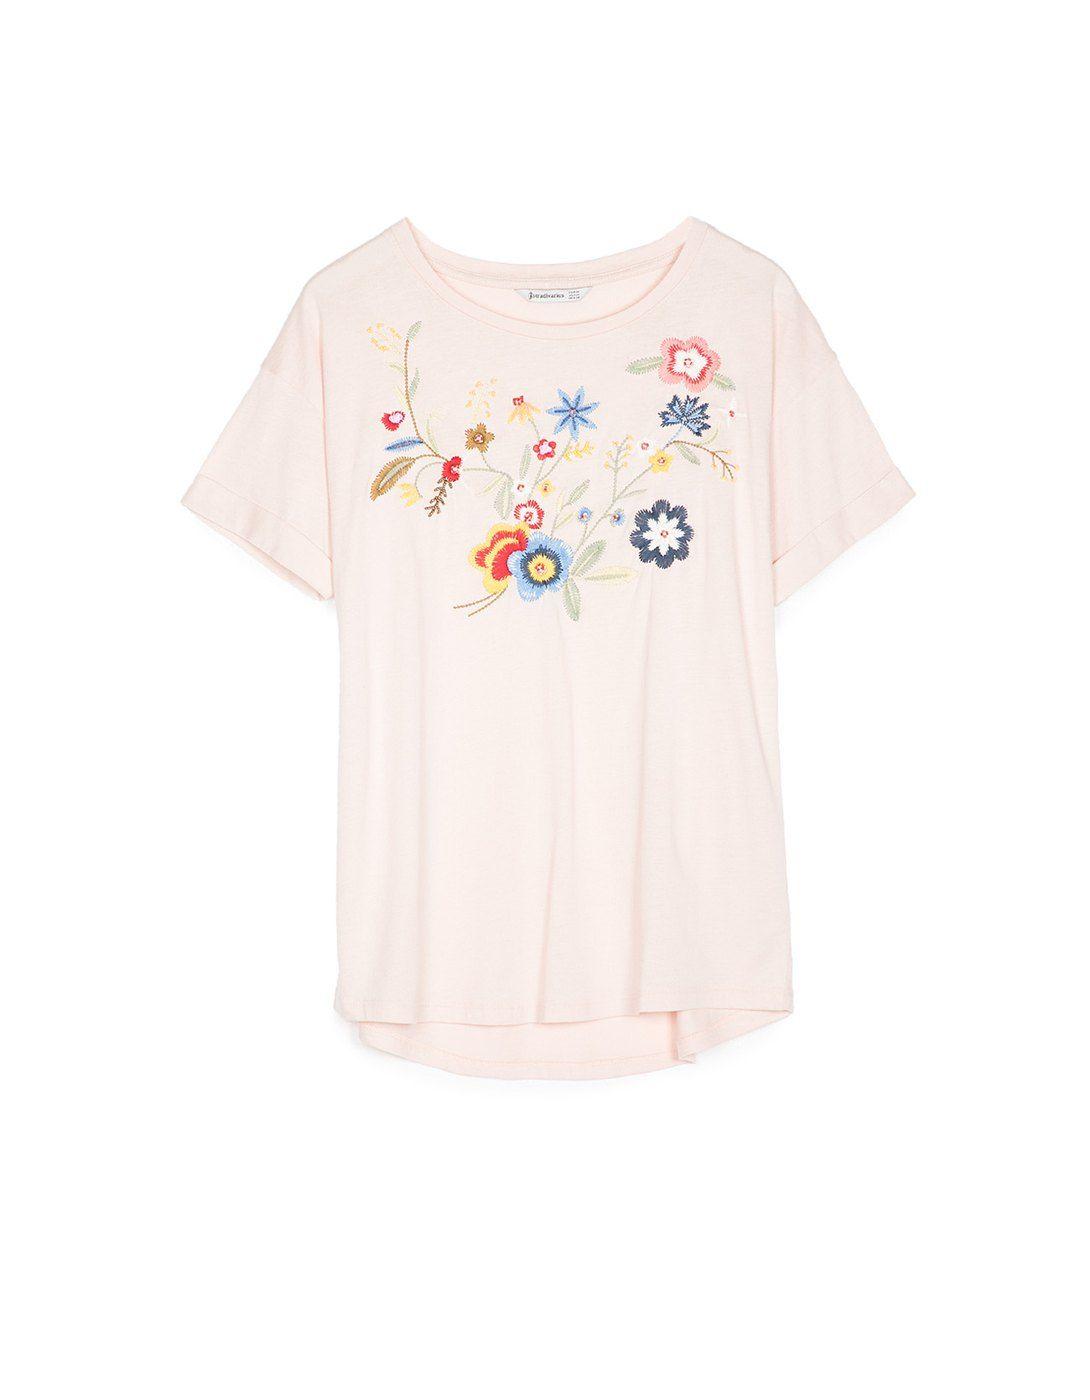 feac669f16dff Camiseta bordados - NUEVO